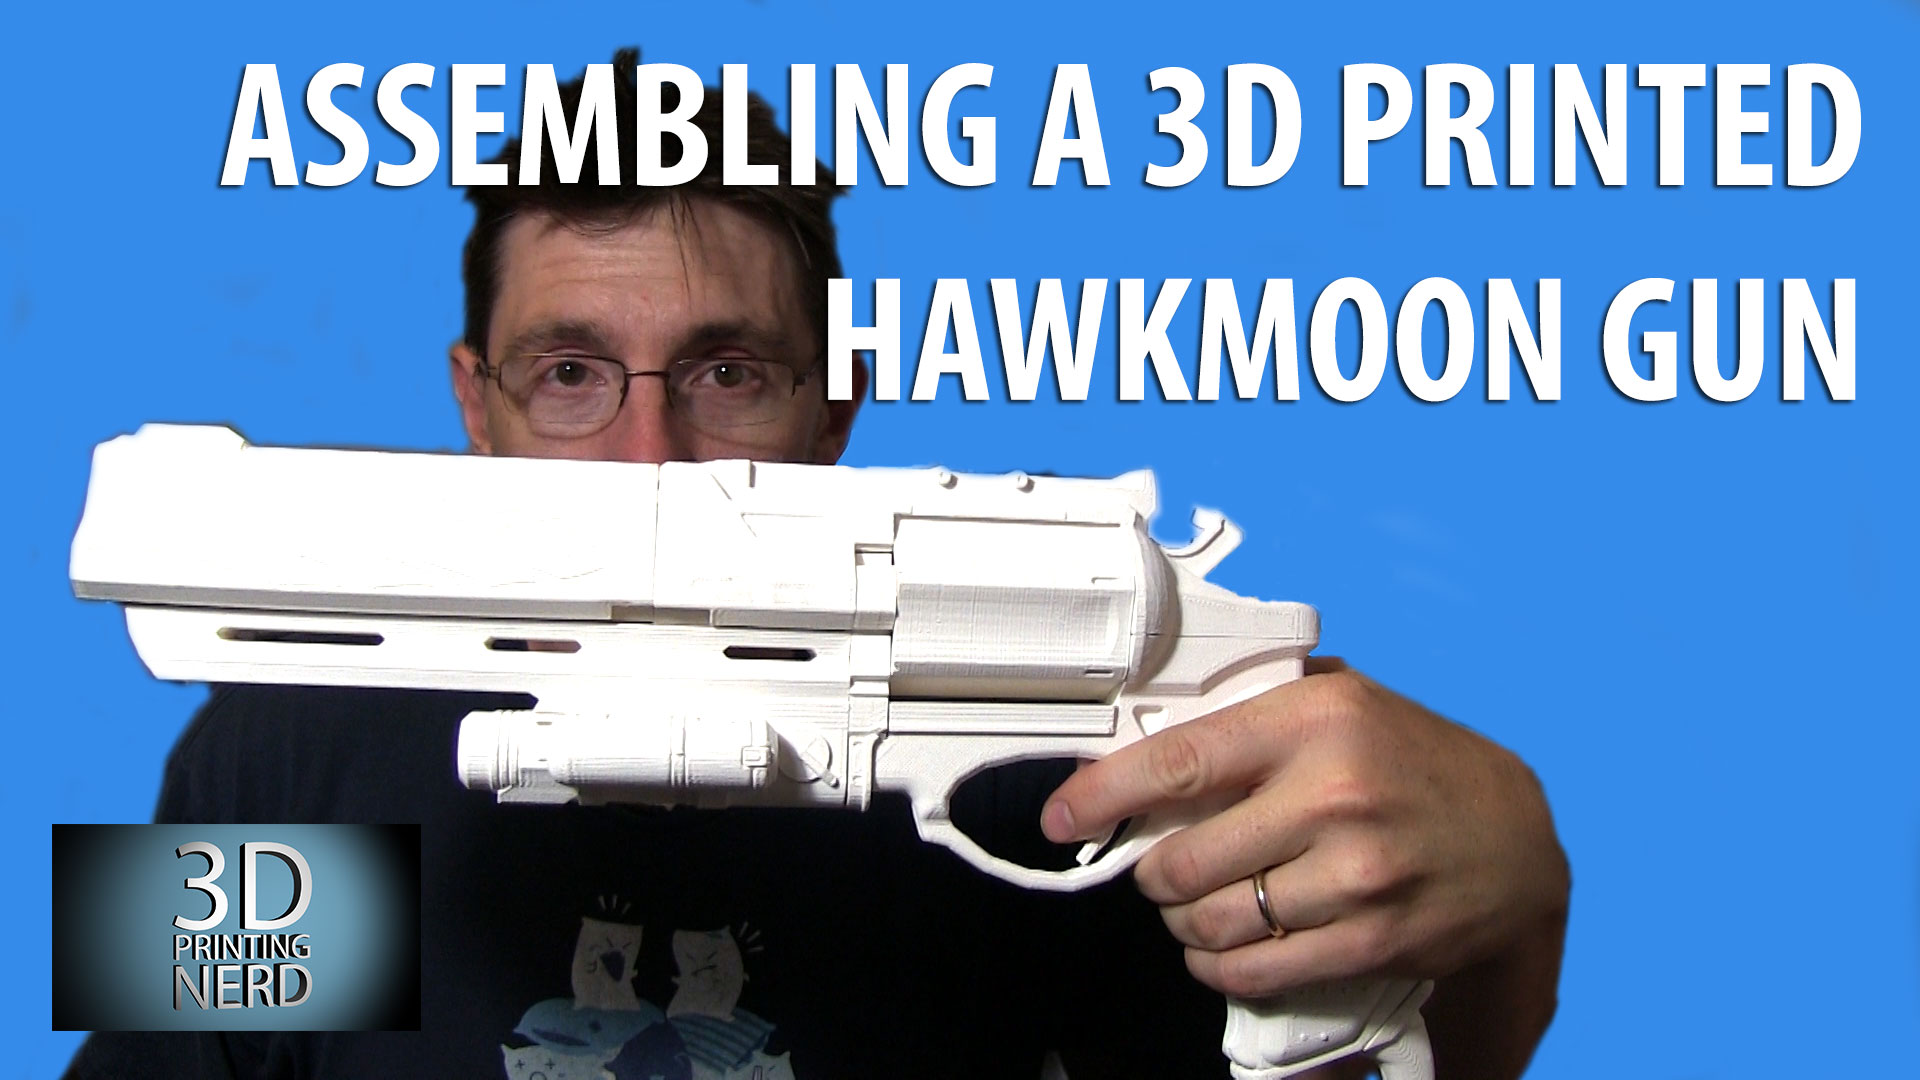 Assembling a 3D printed gun – the Hawkmoon from Destiny